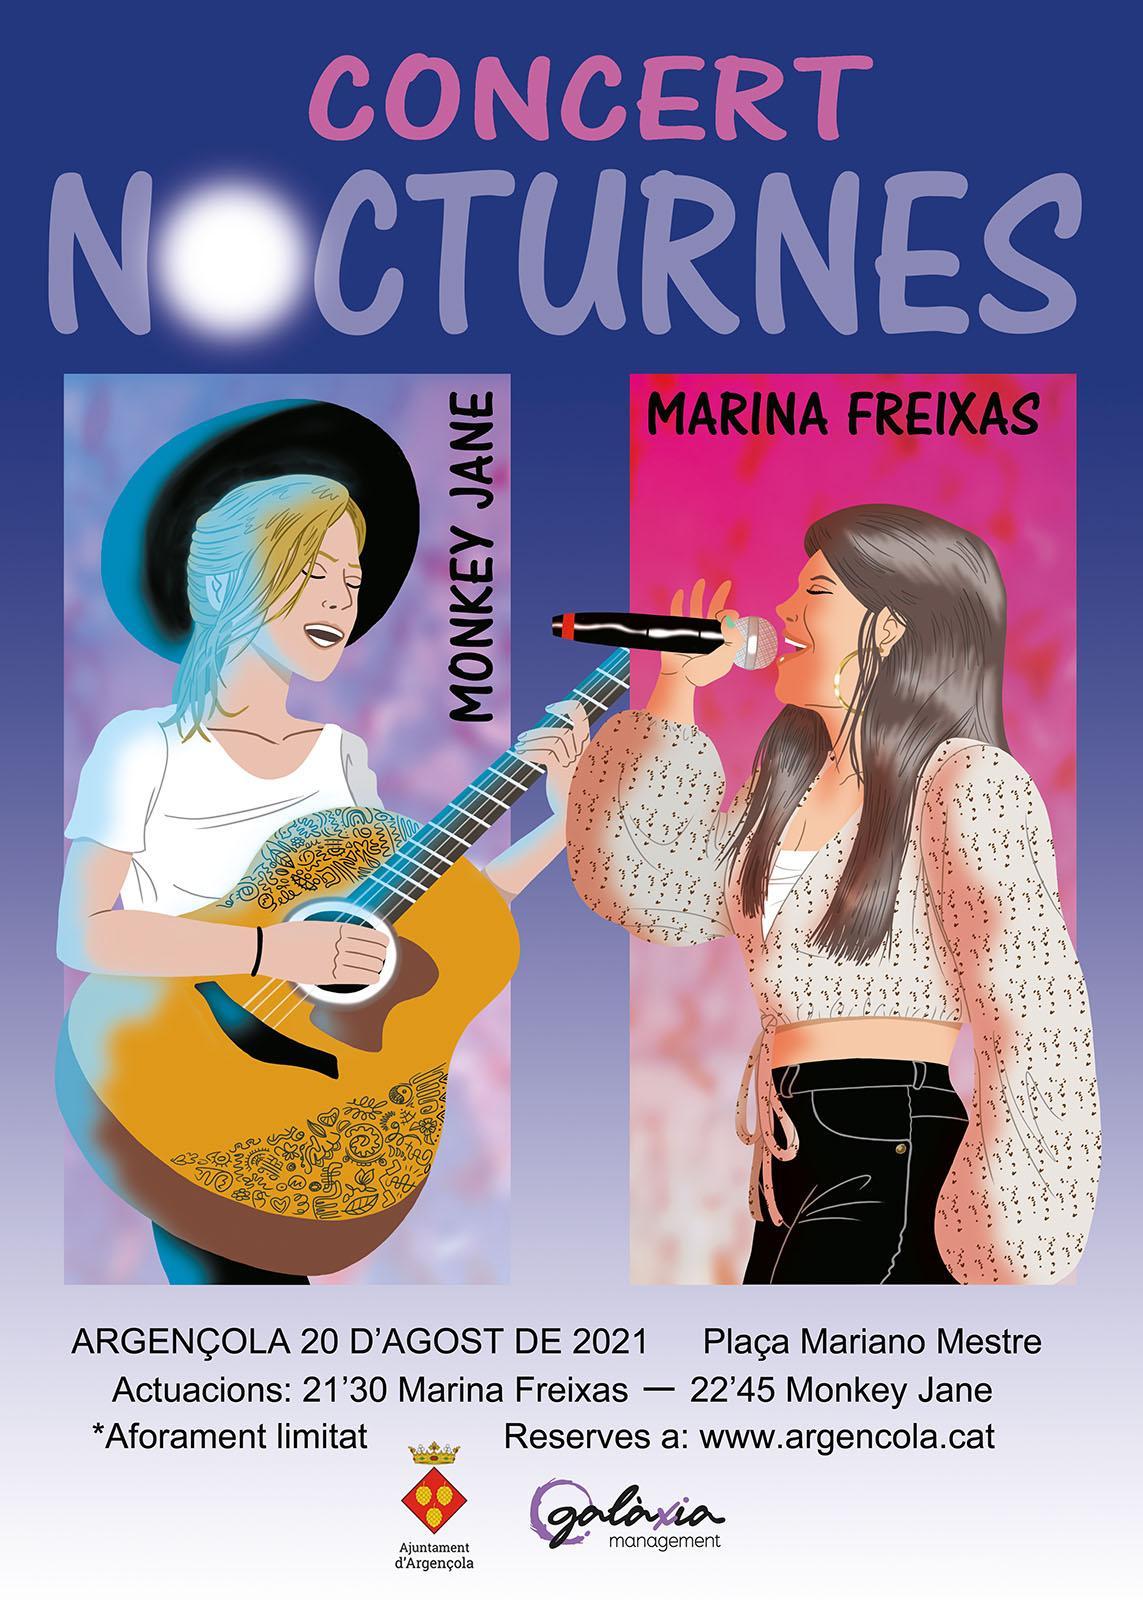 Concert Nocturnes